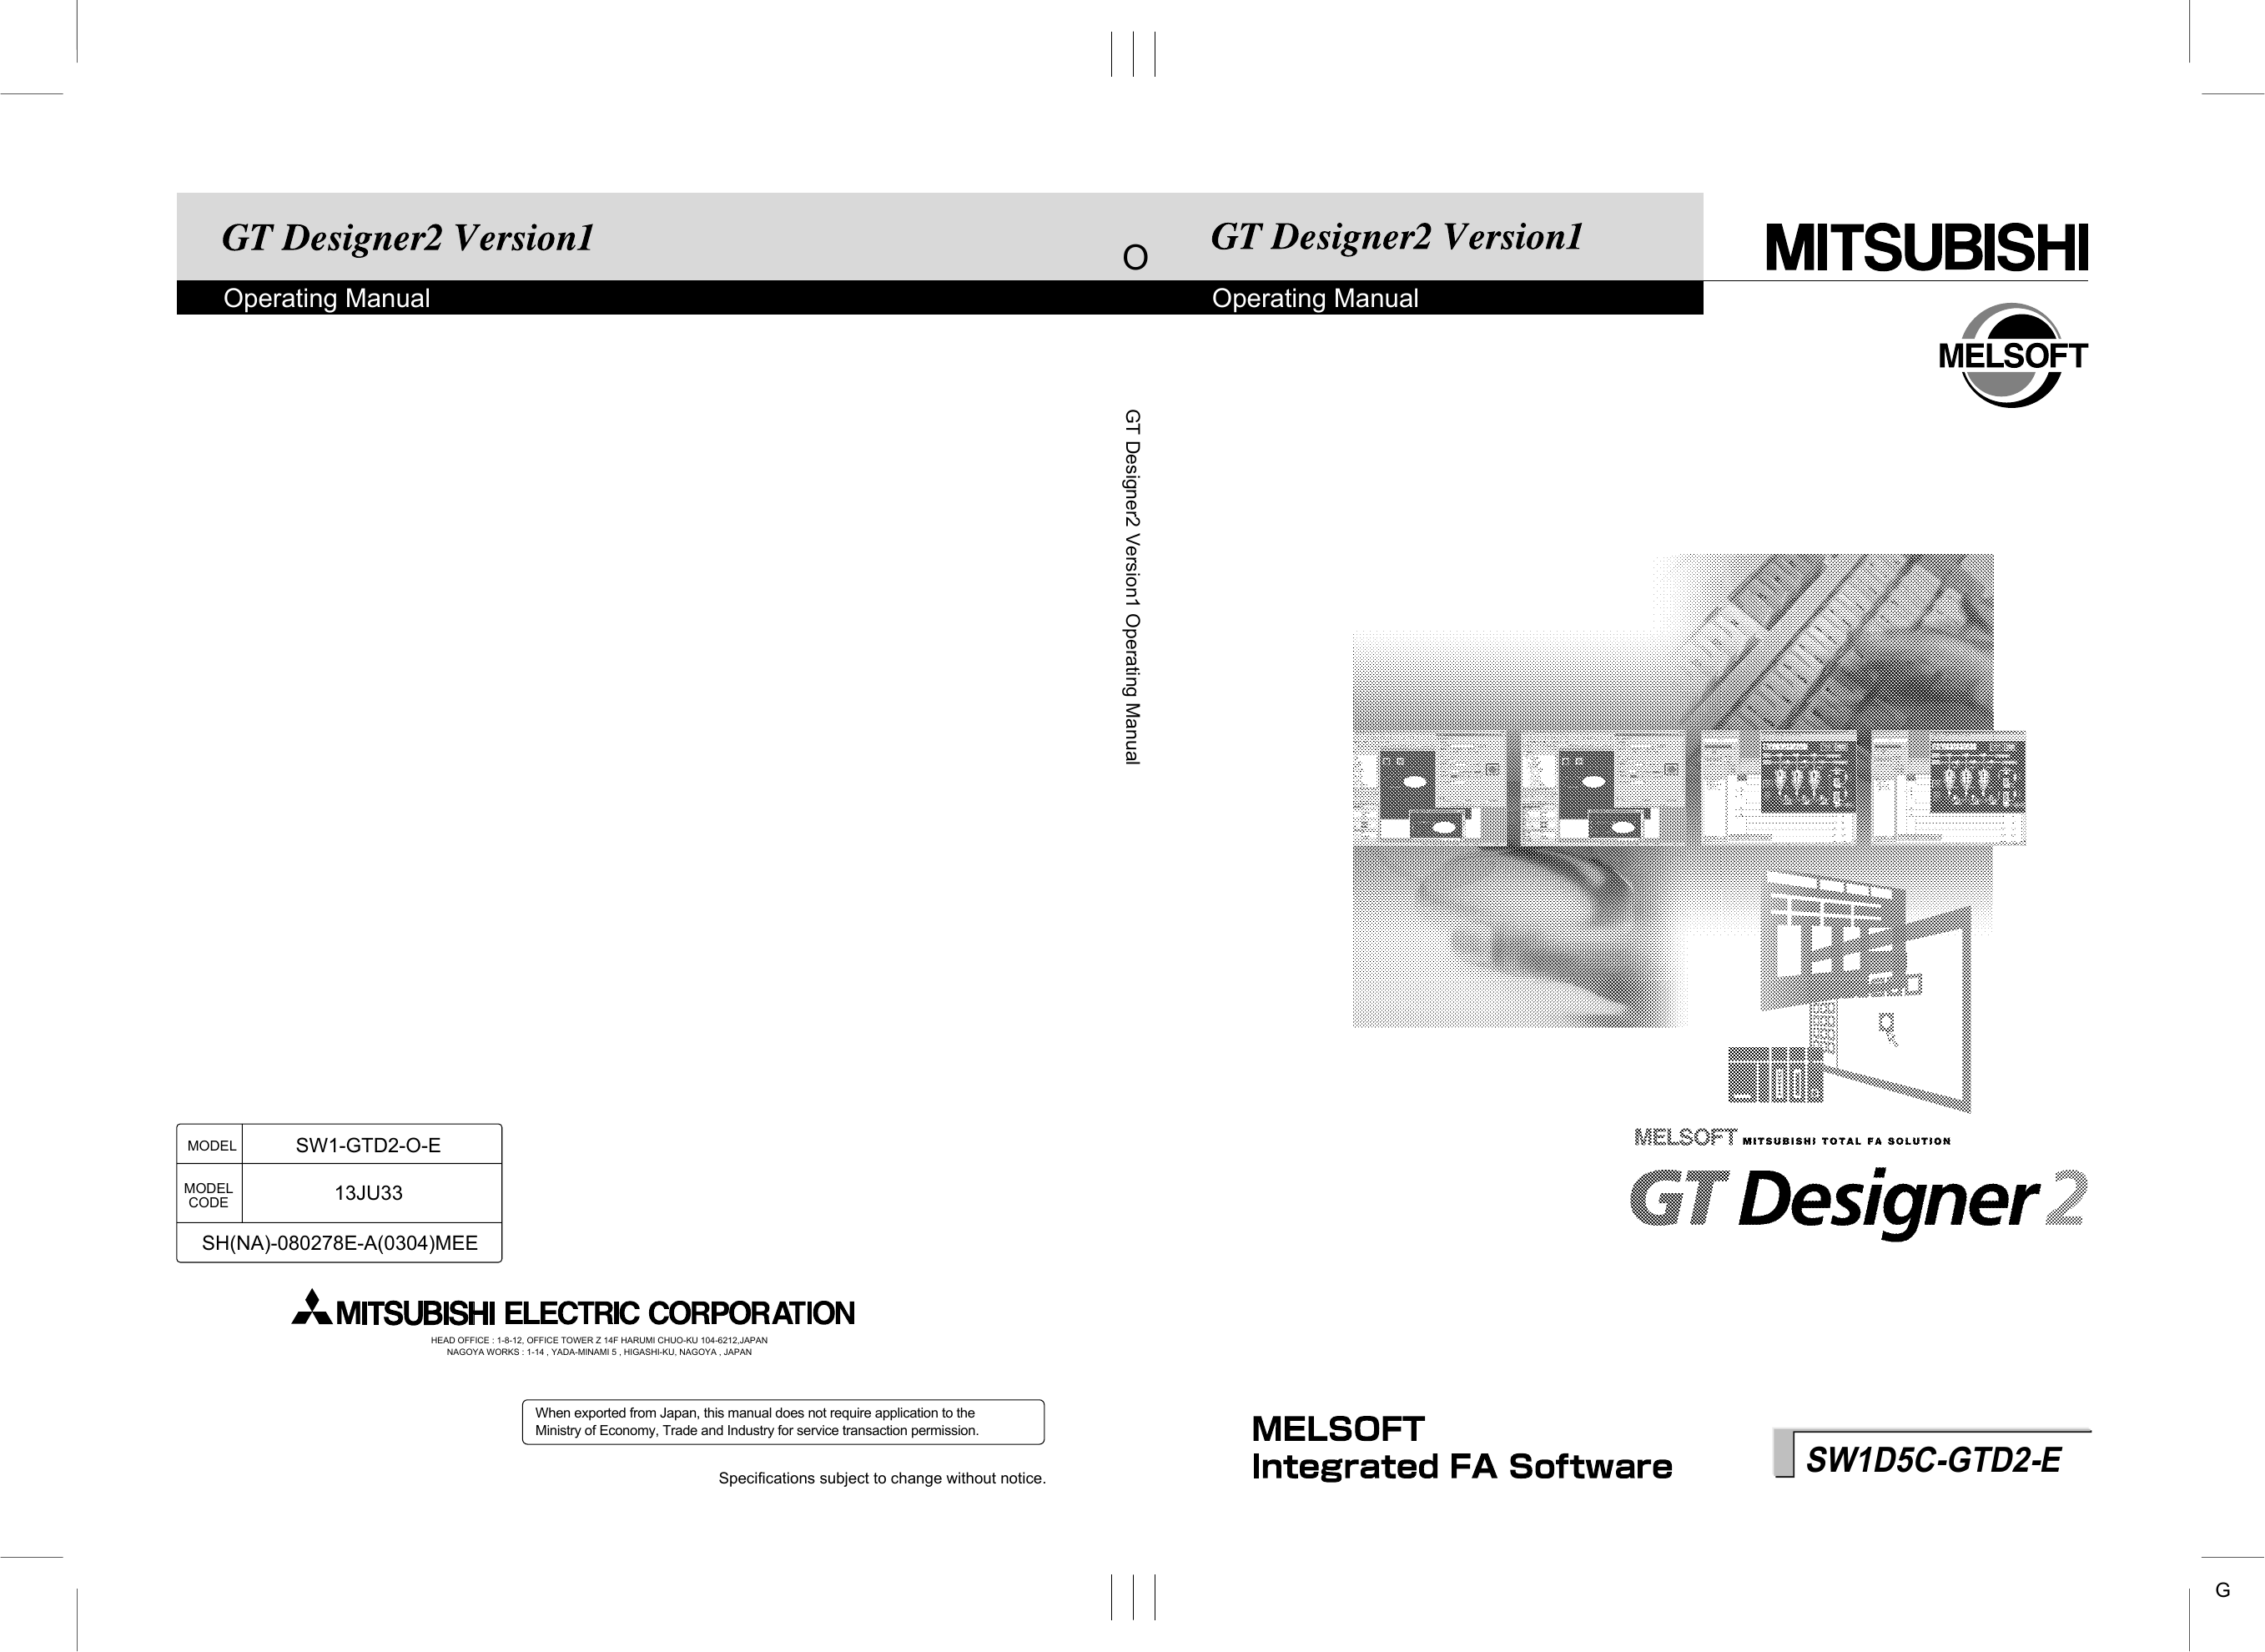 GT Designer2 Version1 Operating Manual